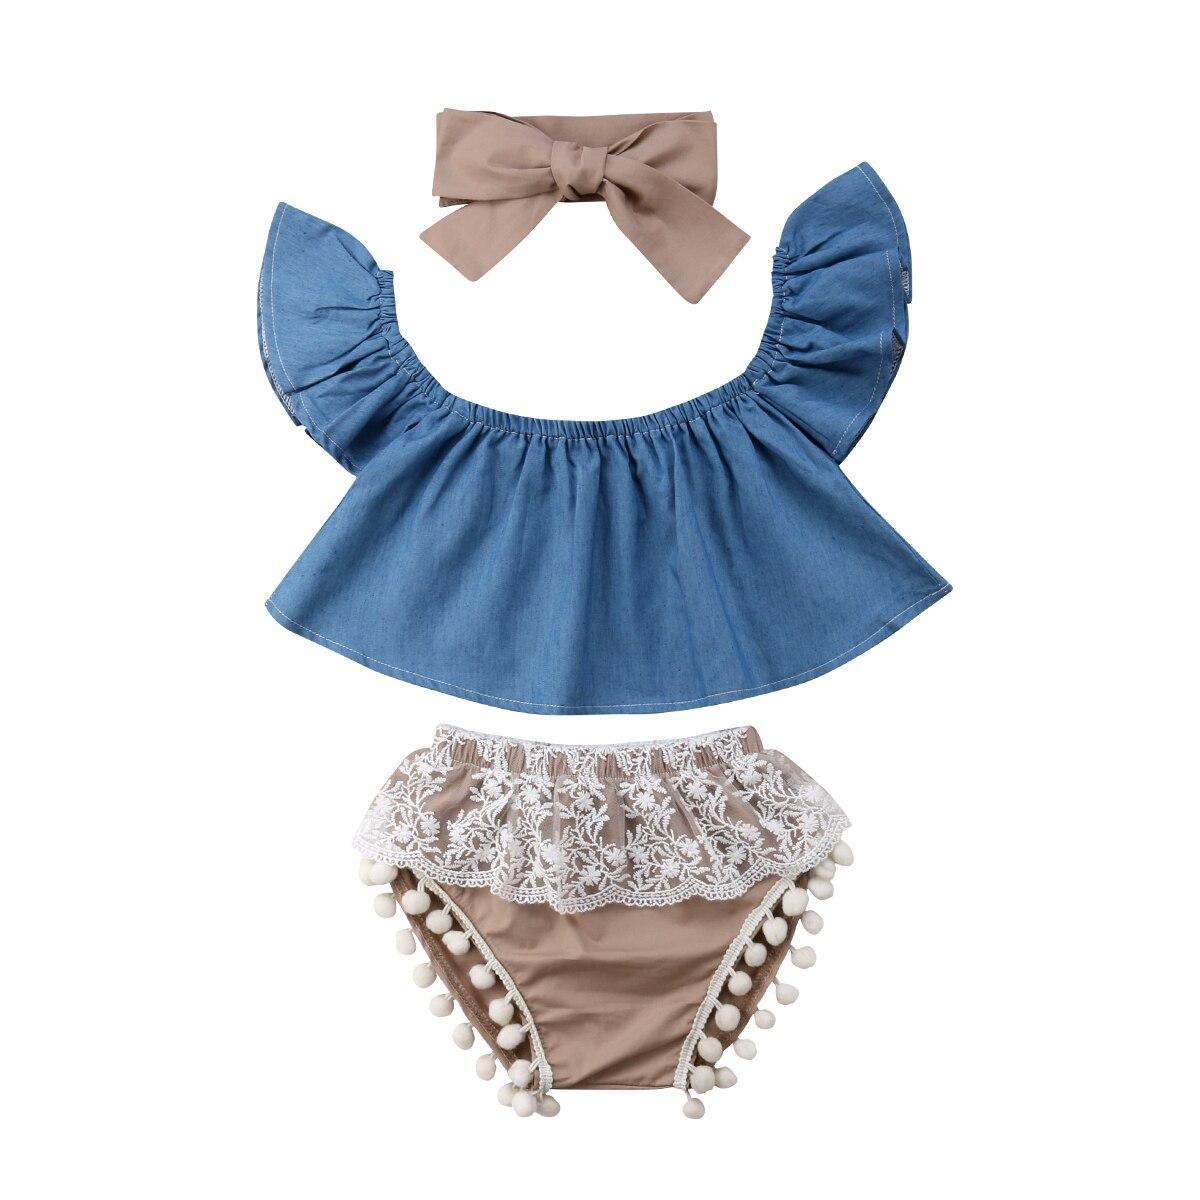 US Newborn Baby Girl Summer Off Shoulder Tops Dress+Short+Headband 3Pcs Outfits